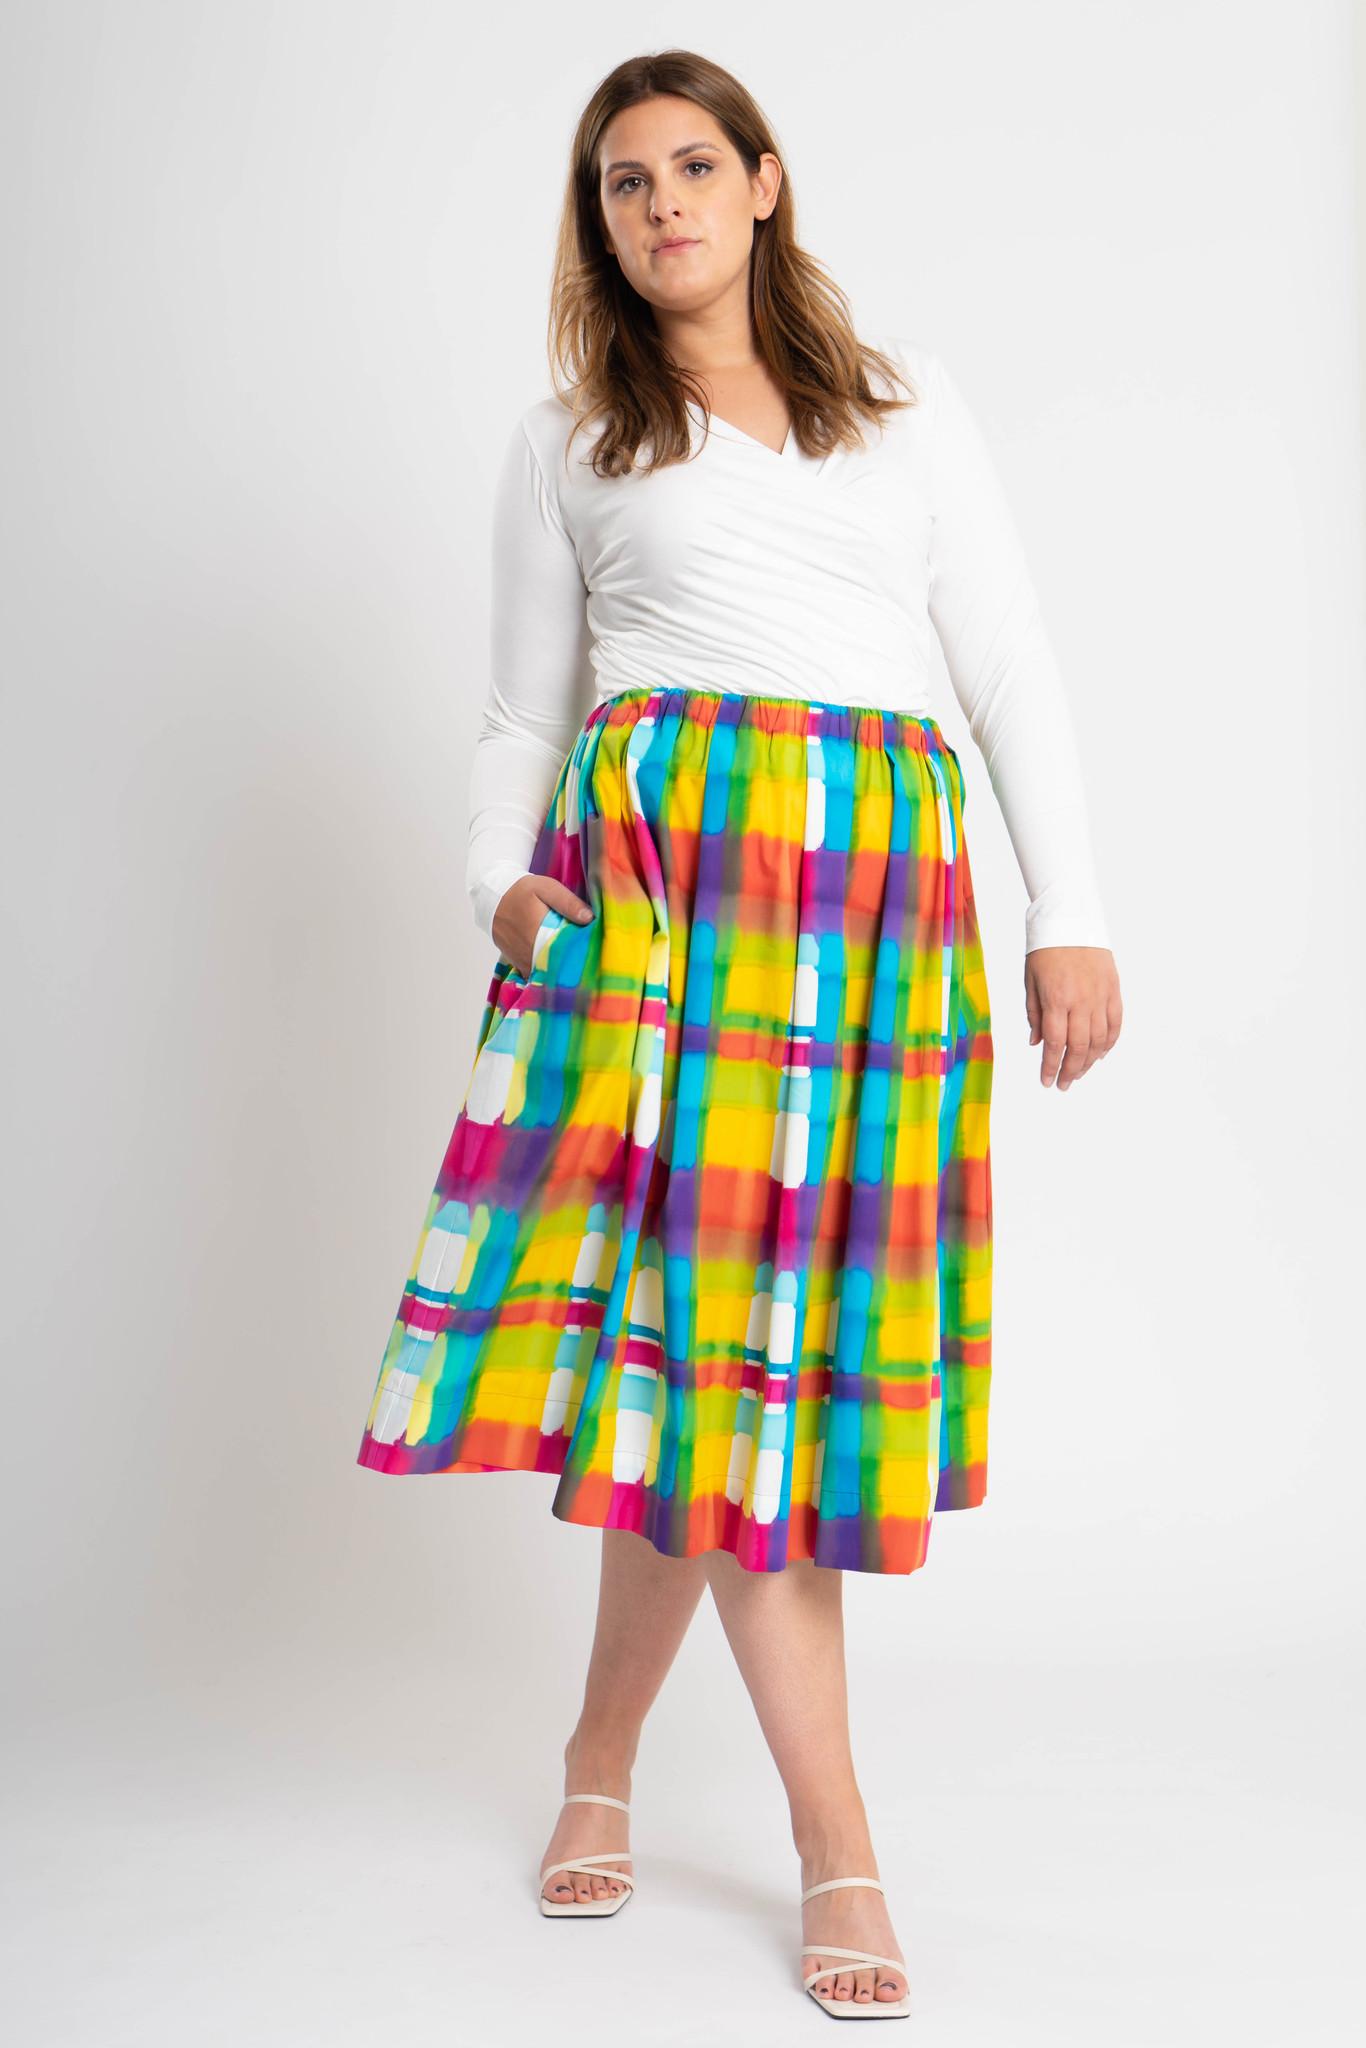 TULIP Skirt in Cotton-8